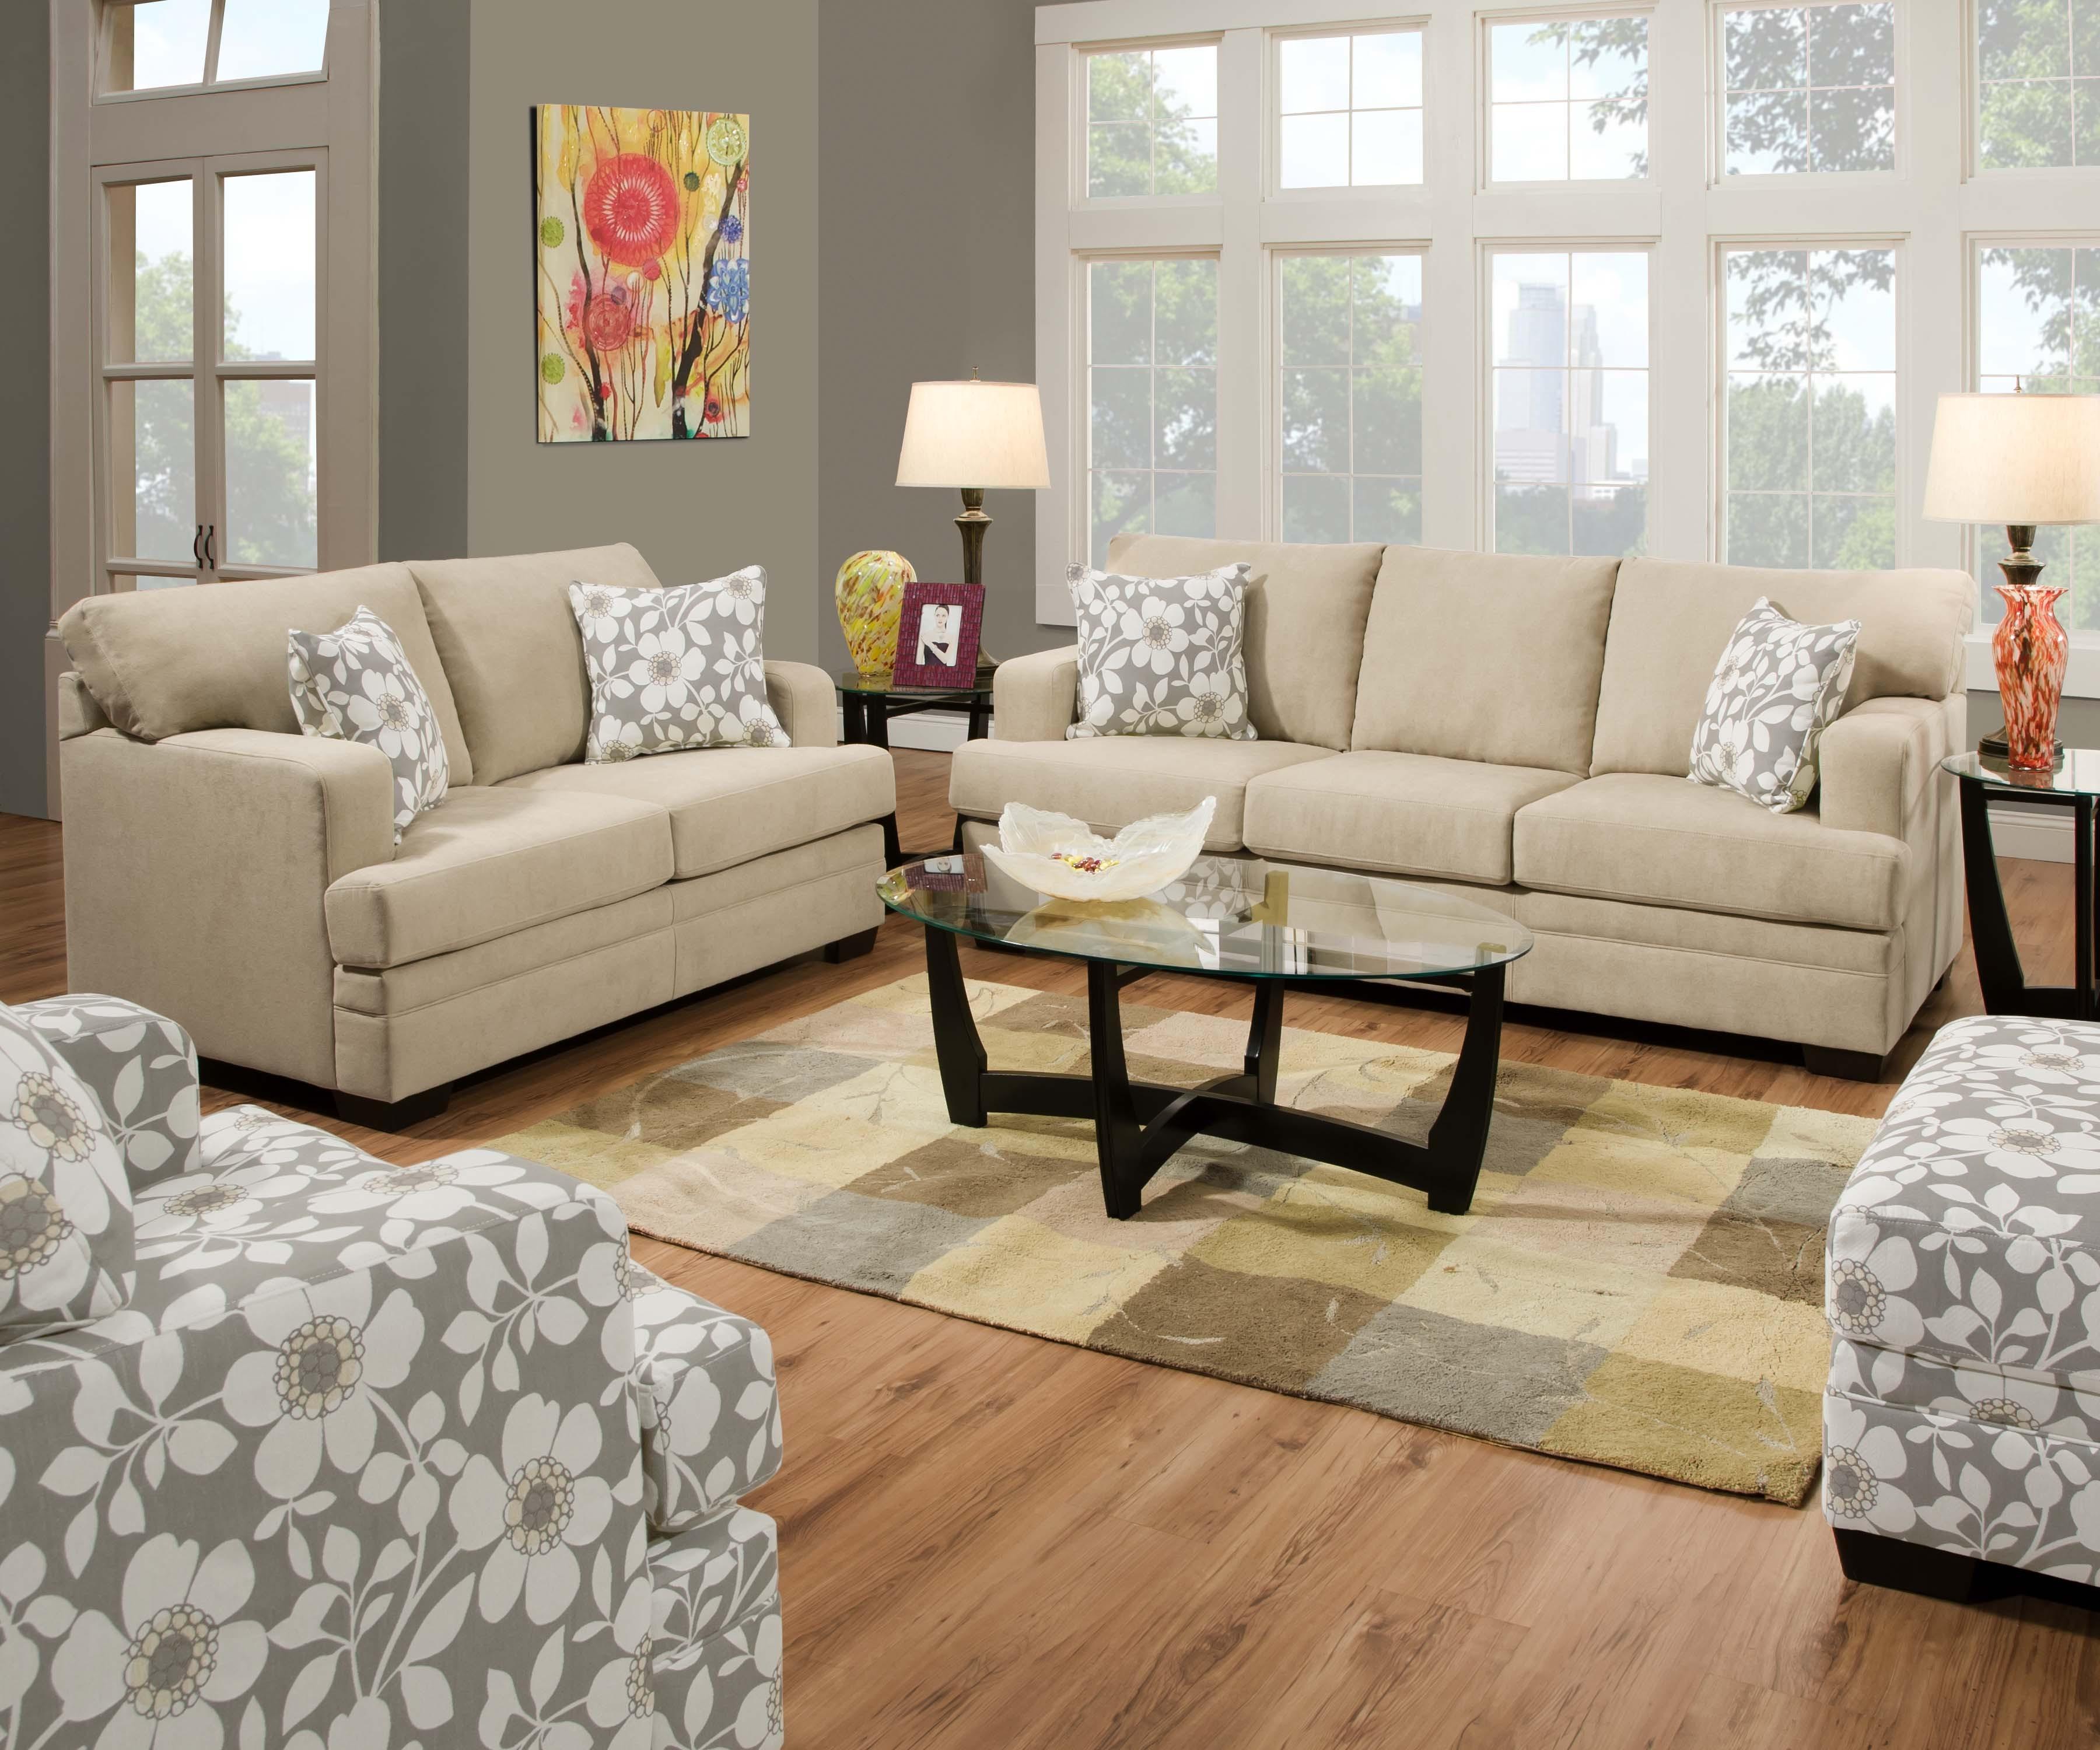 6491 caprice hemp madison furniture direct - Cojines para sofas de piel ...